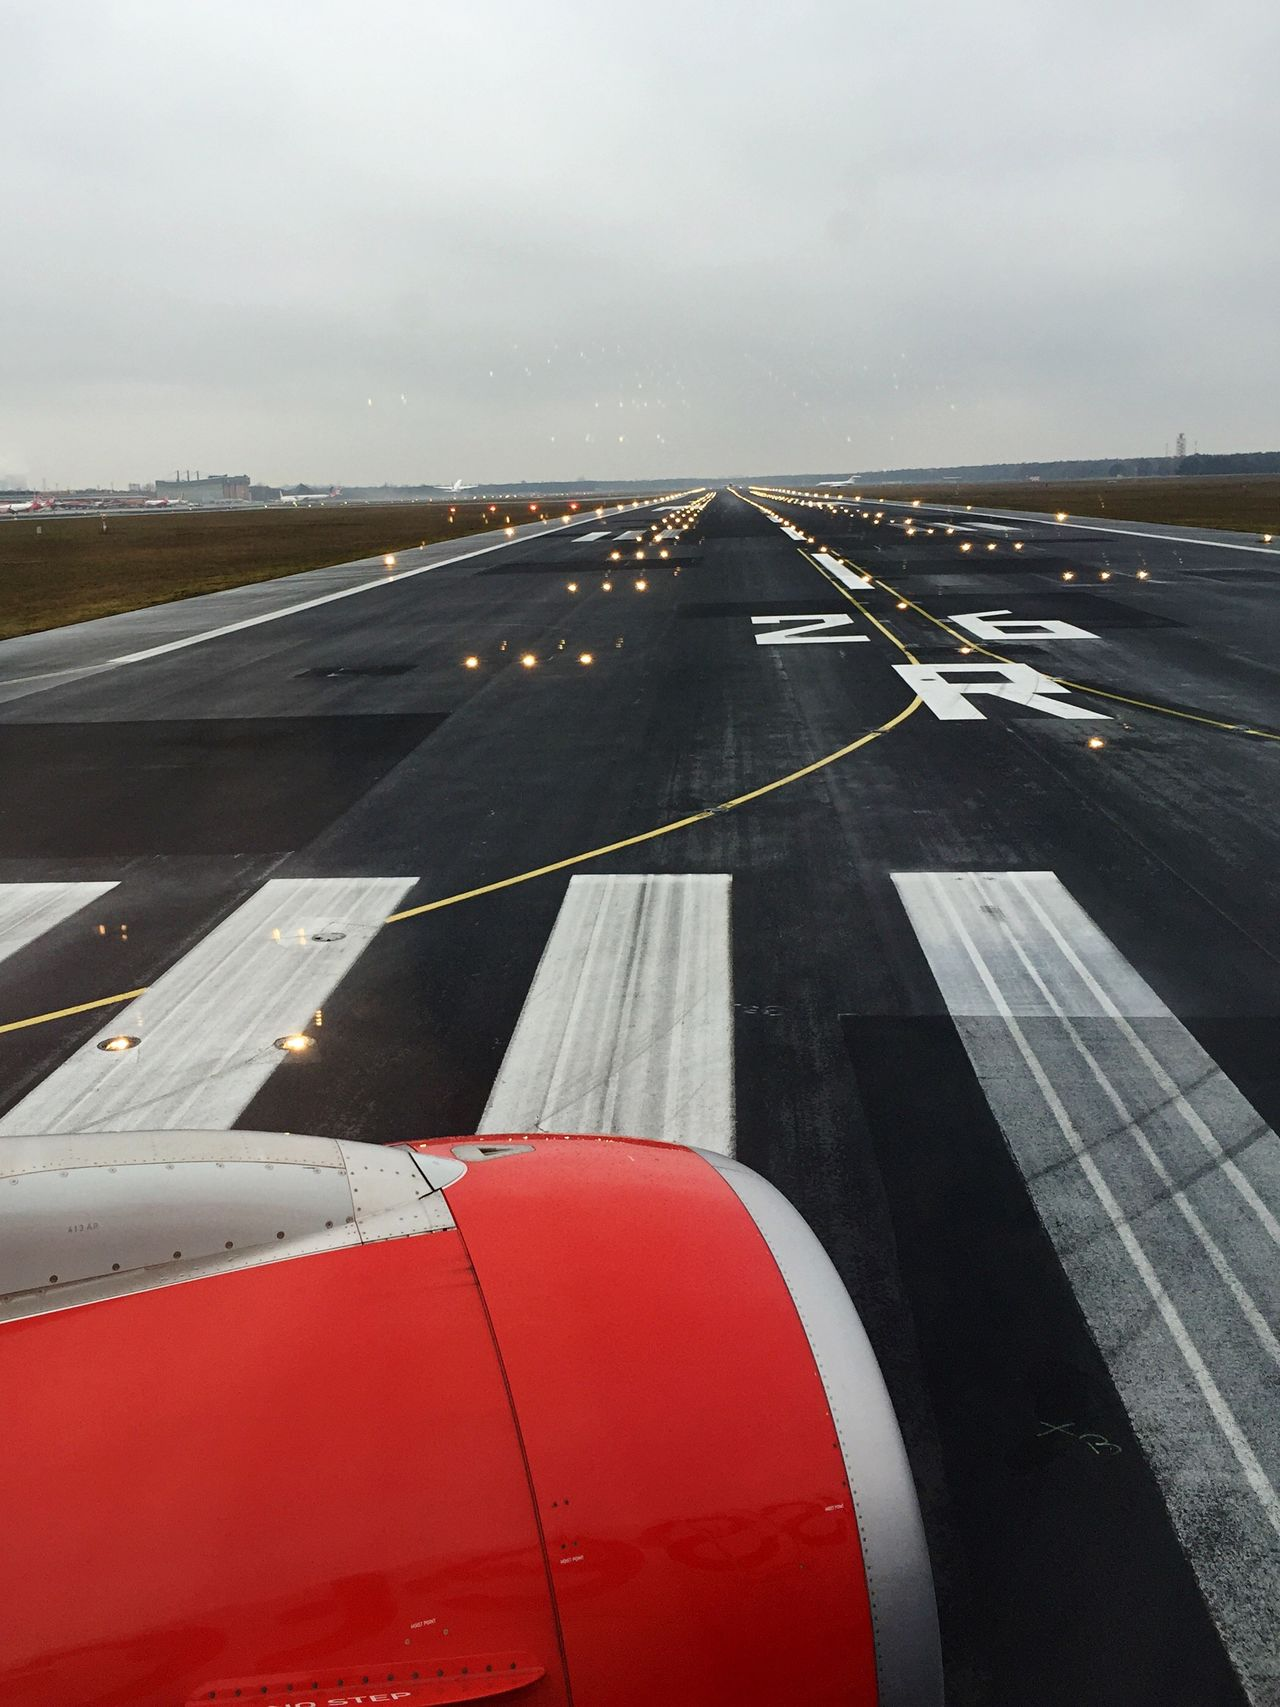 Beautiful stock photos of airport, Air Vehicle, Airplane, Airport, Airport Runway